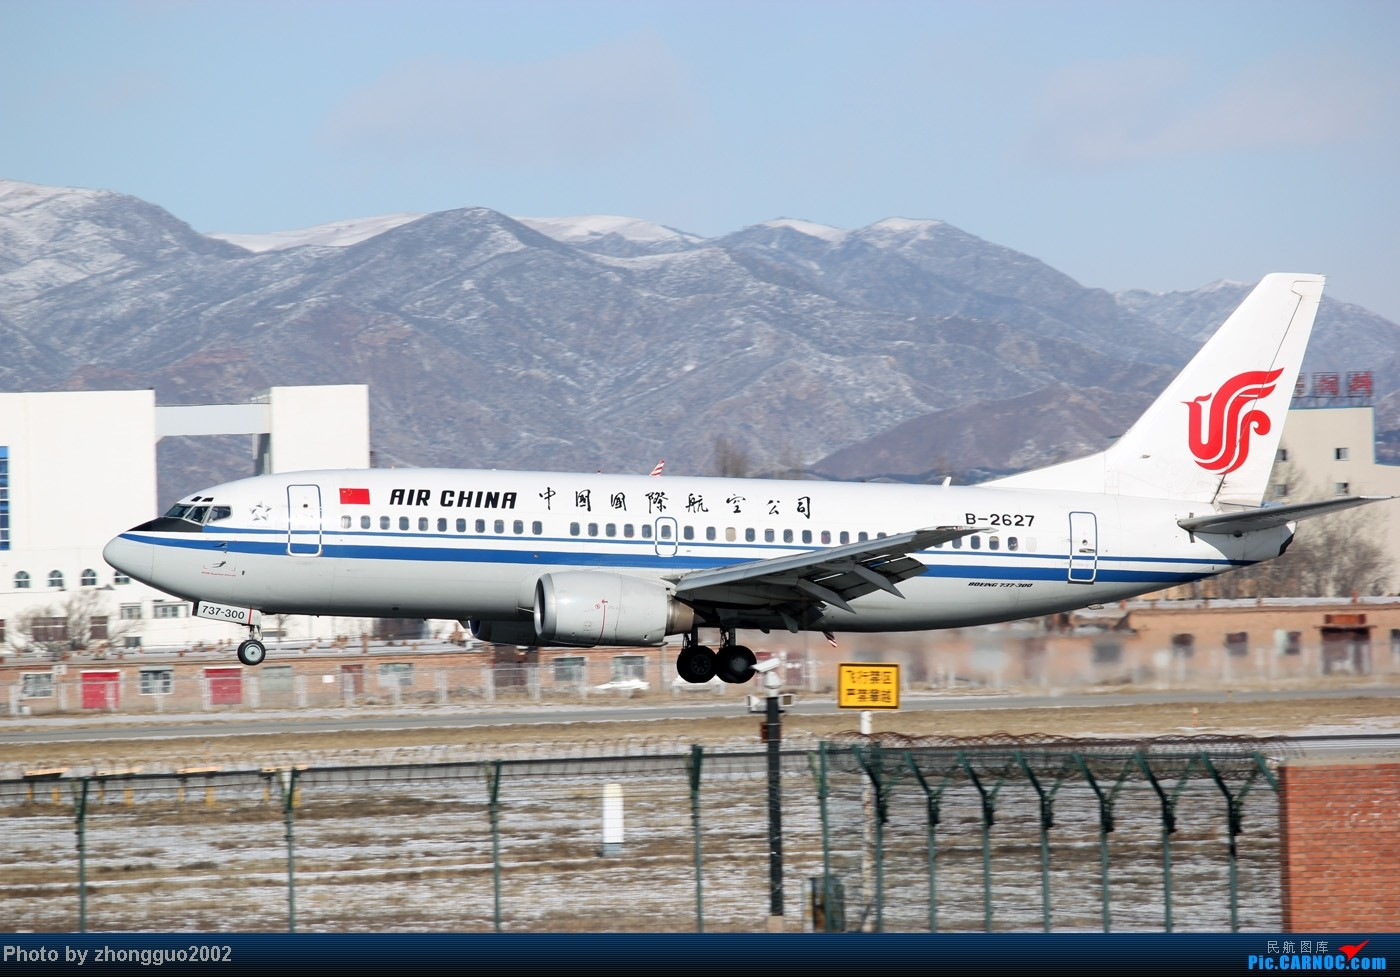 Re:[原创]随着2012年的最后一场雪的到了,我的2012年拍机工作也圆满的结束了,把这段时间里灰机整理一下,把没发的,我个人认为好的发上来! BOEING 737-300 B-2627 中国呼和浩特白塔国际机场